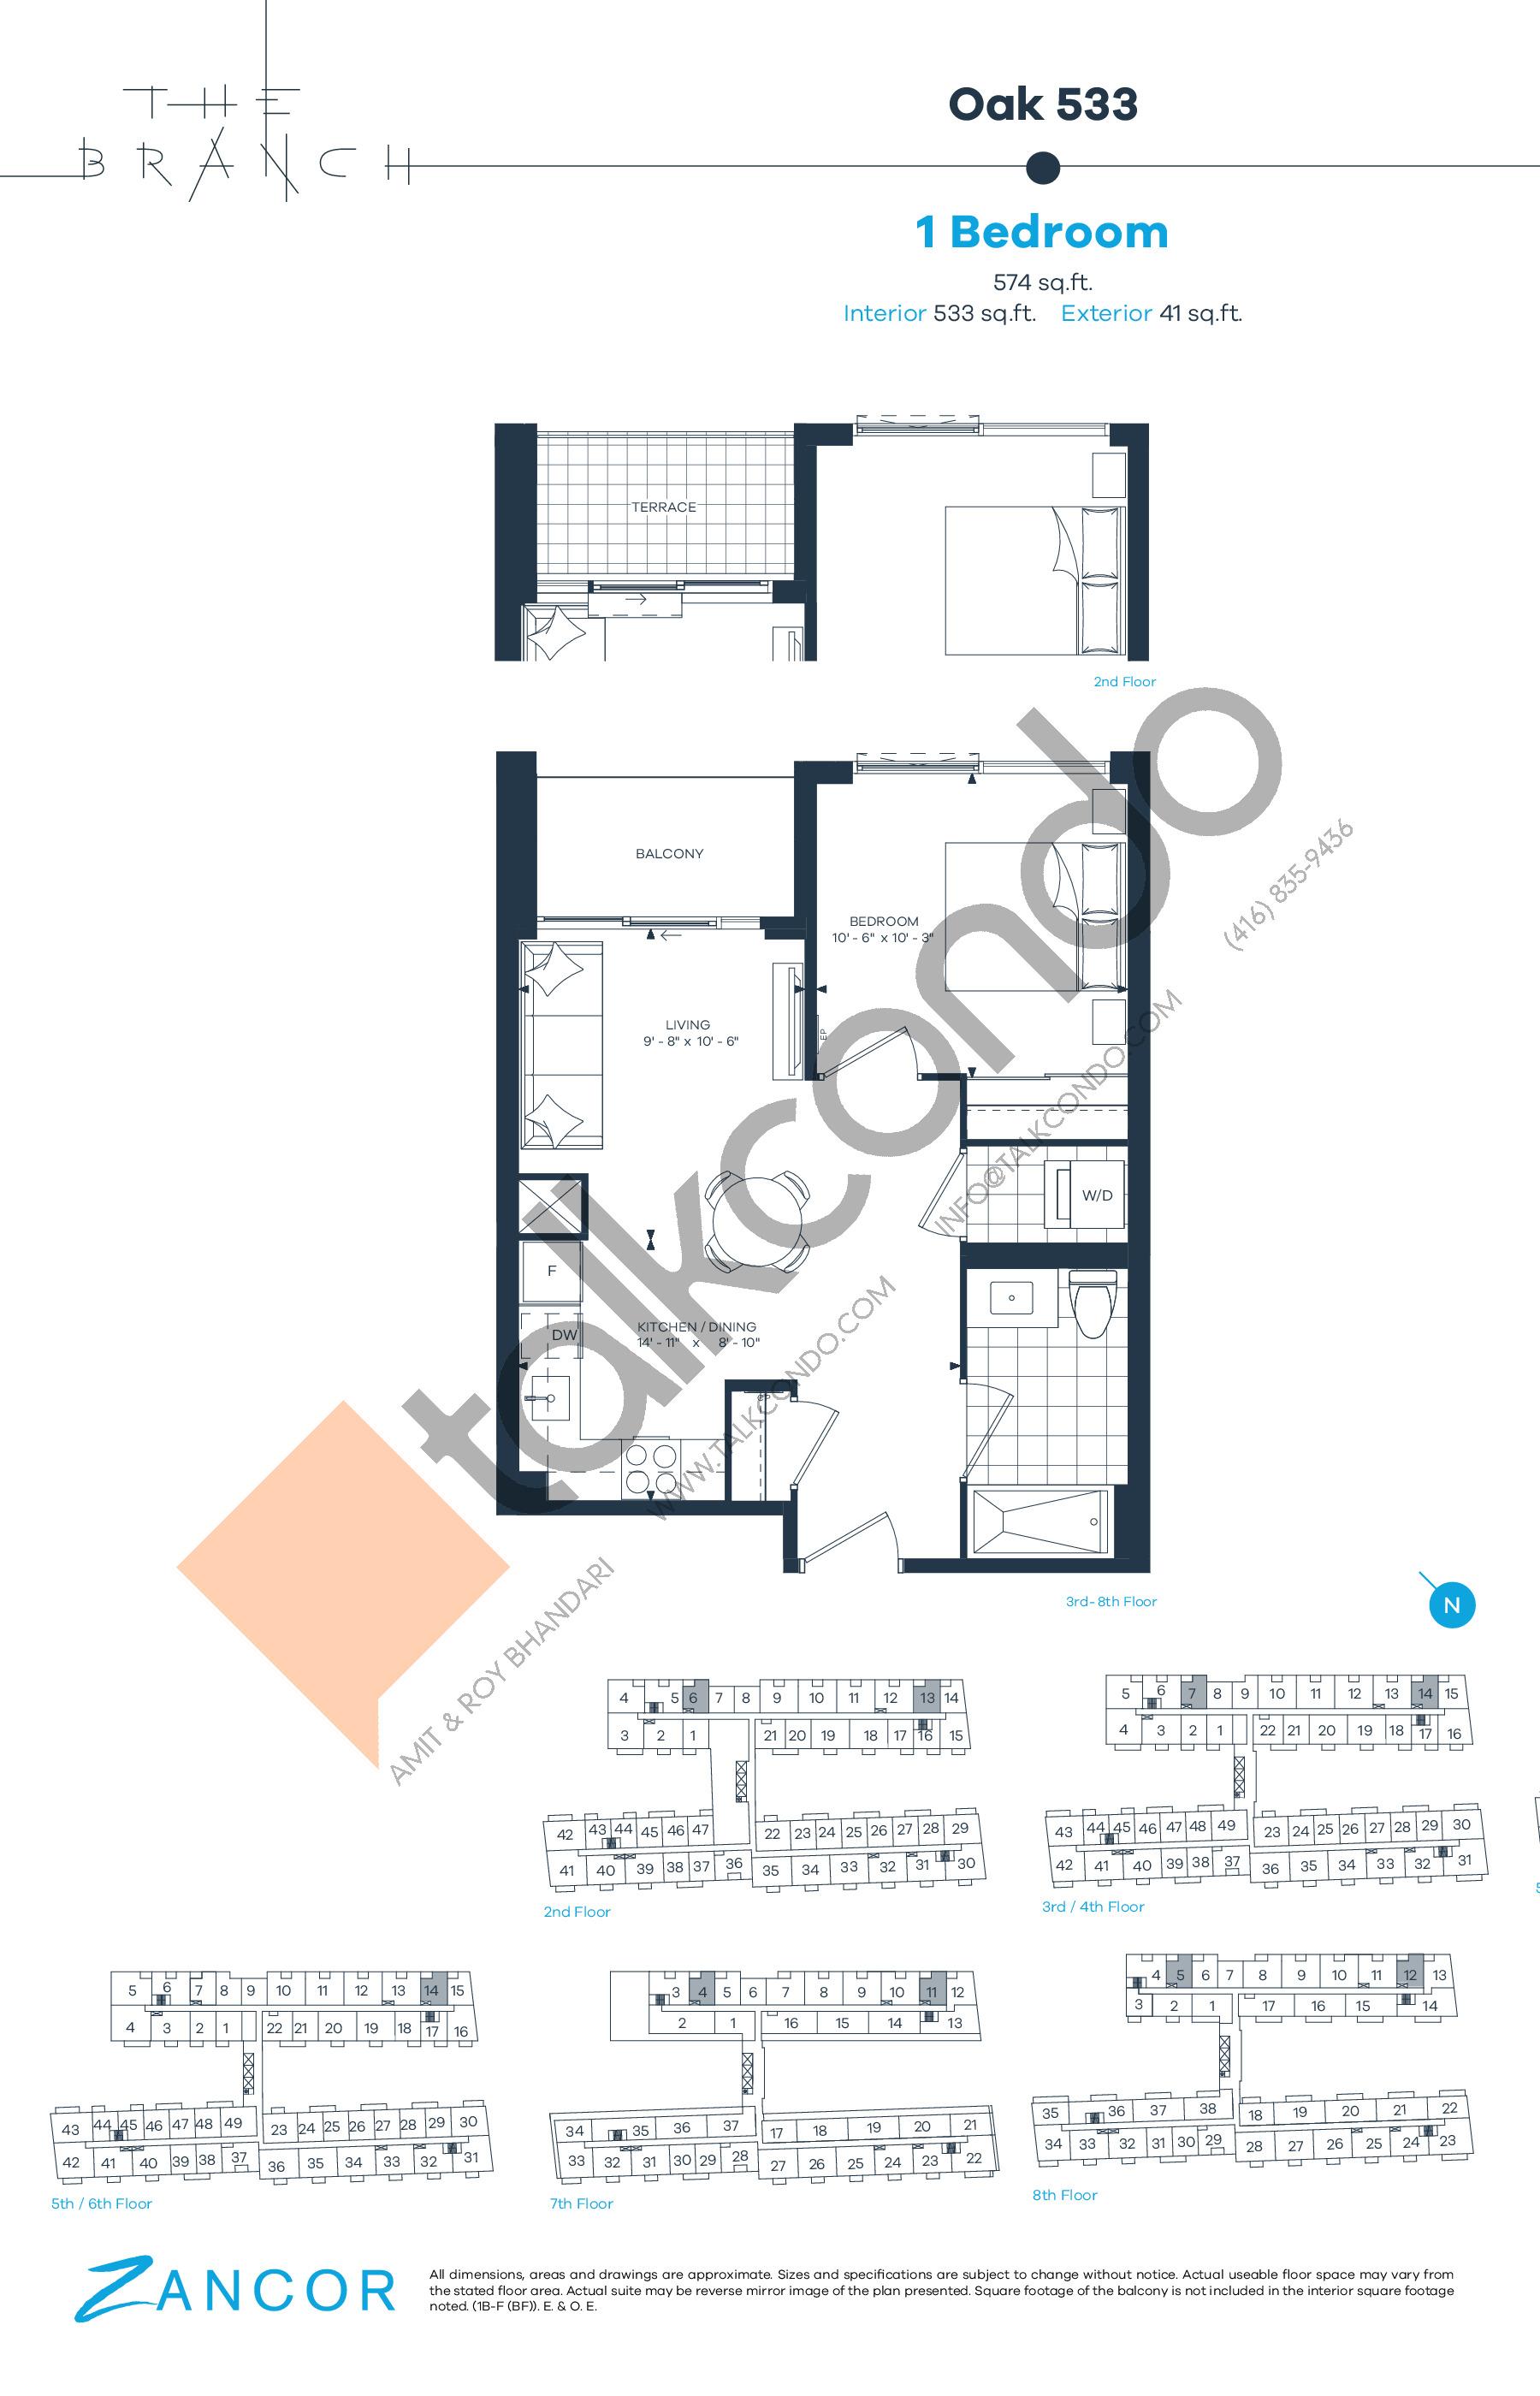 Oak 533 Floor Plan at The Branch Condos - 533 sq.ft